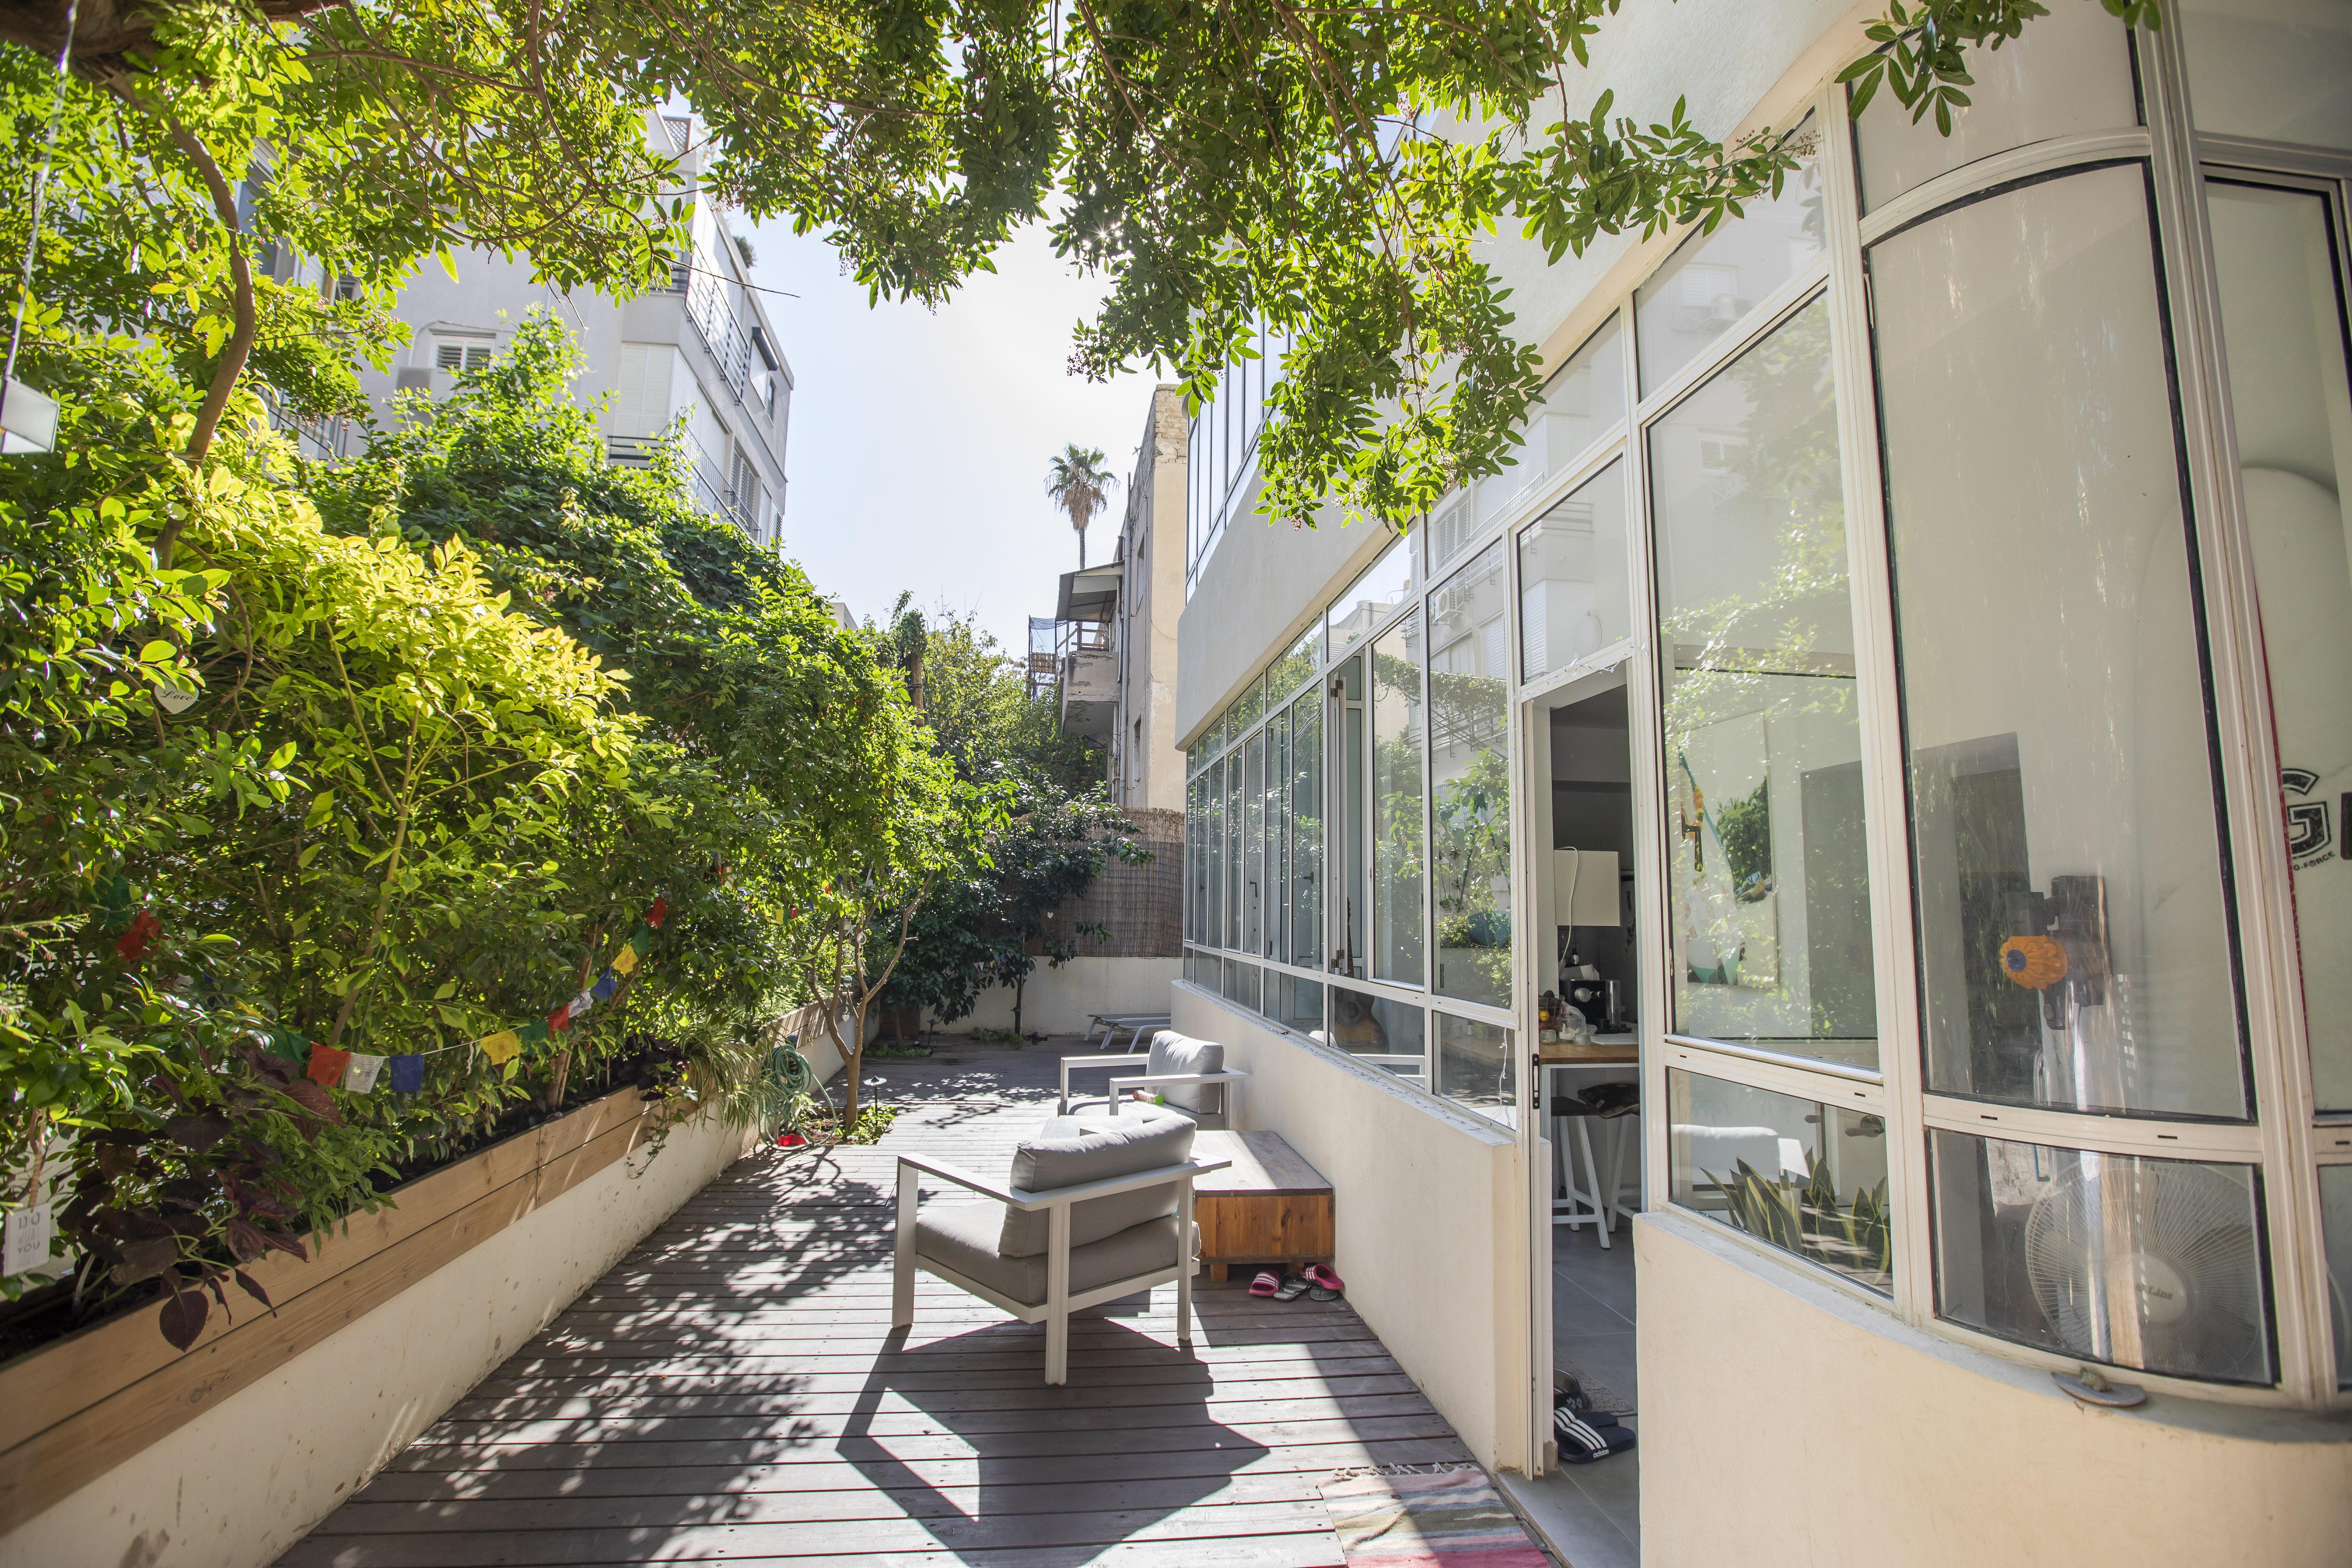 Garden apartment on Ben Yehuda street